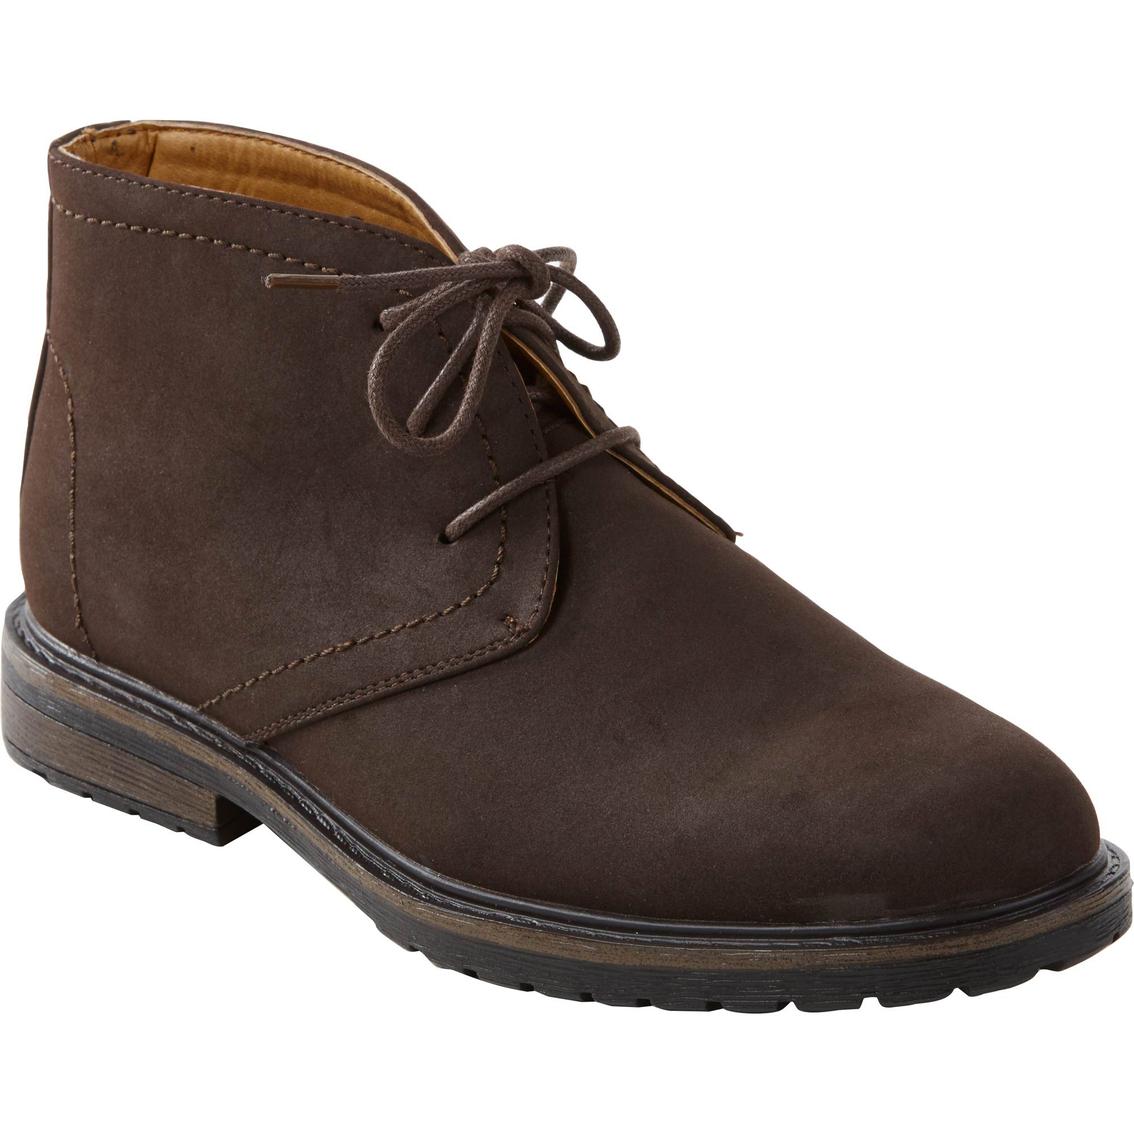 Freeman Shoe Store